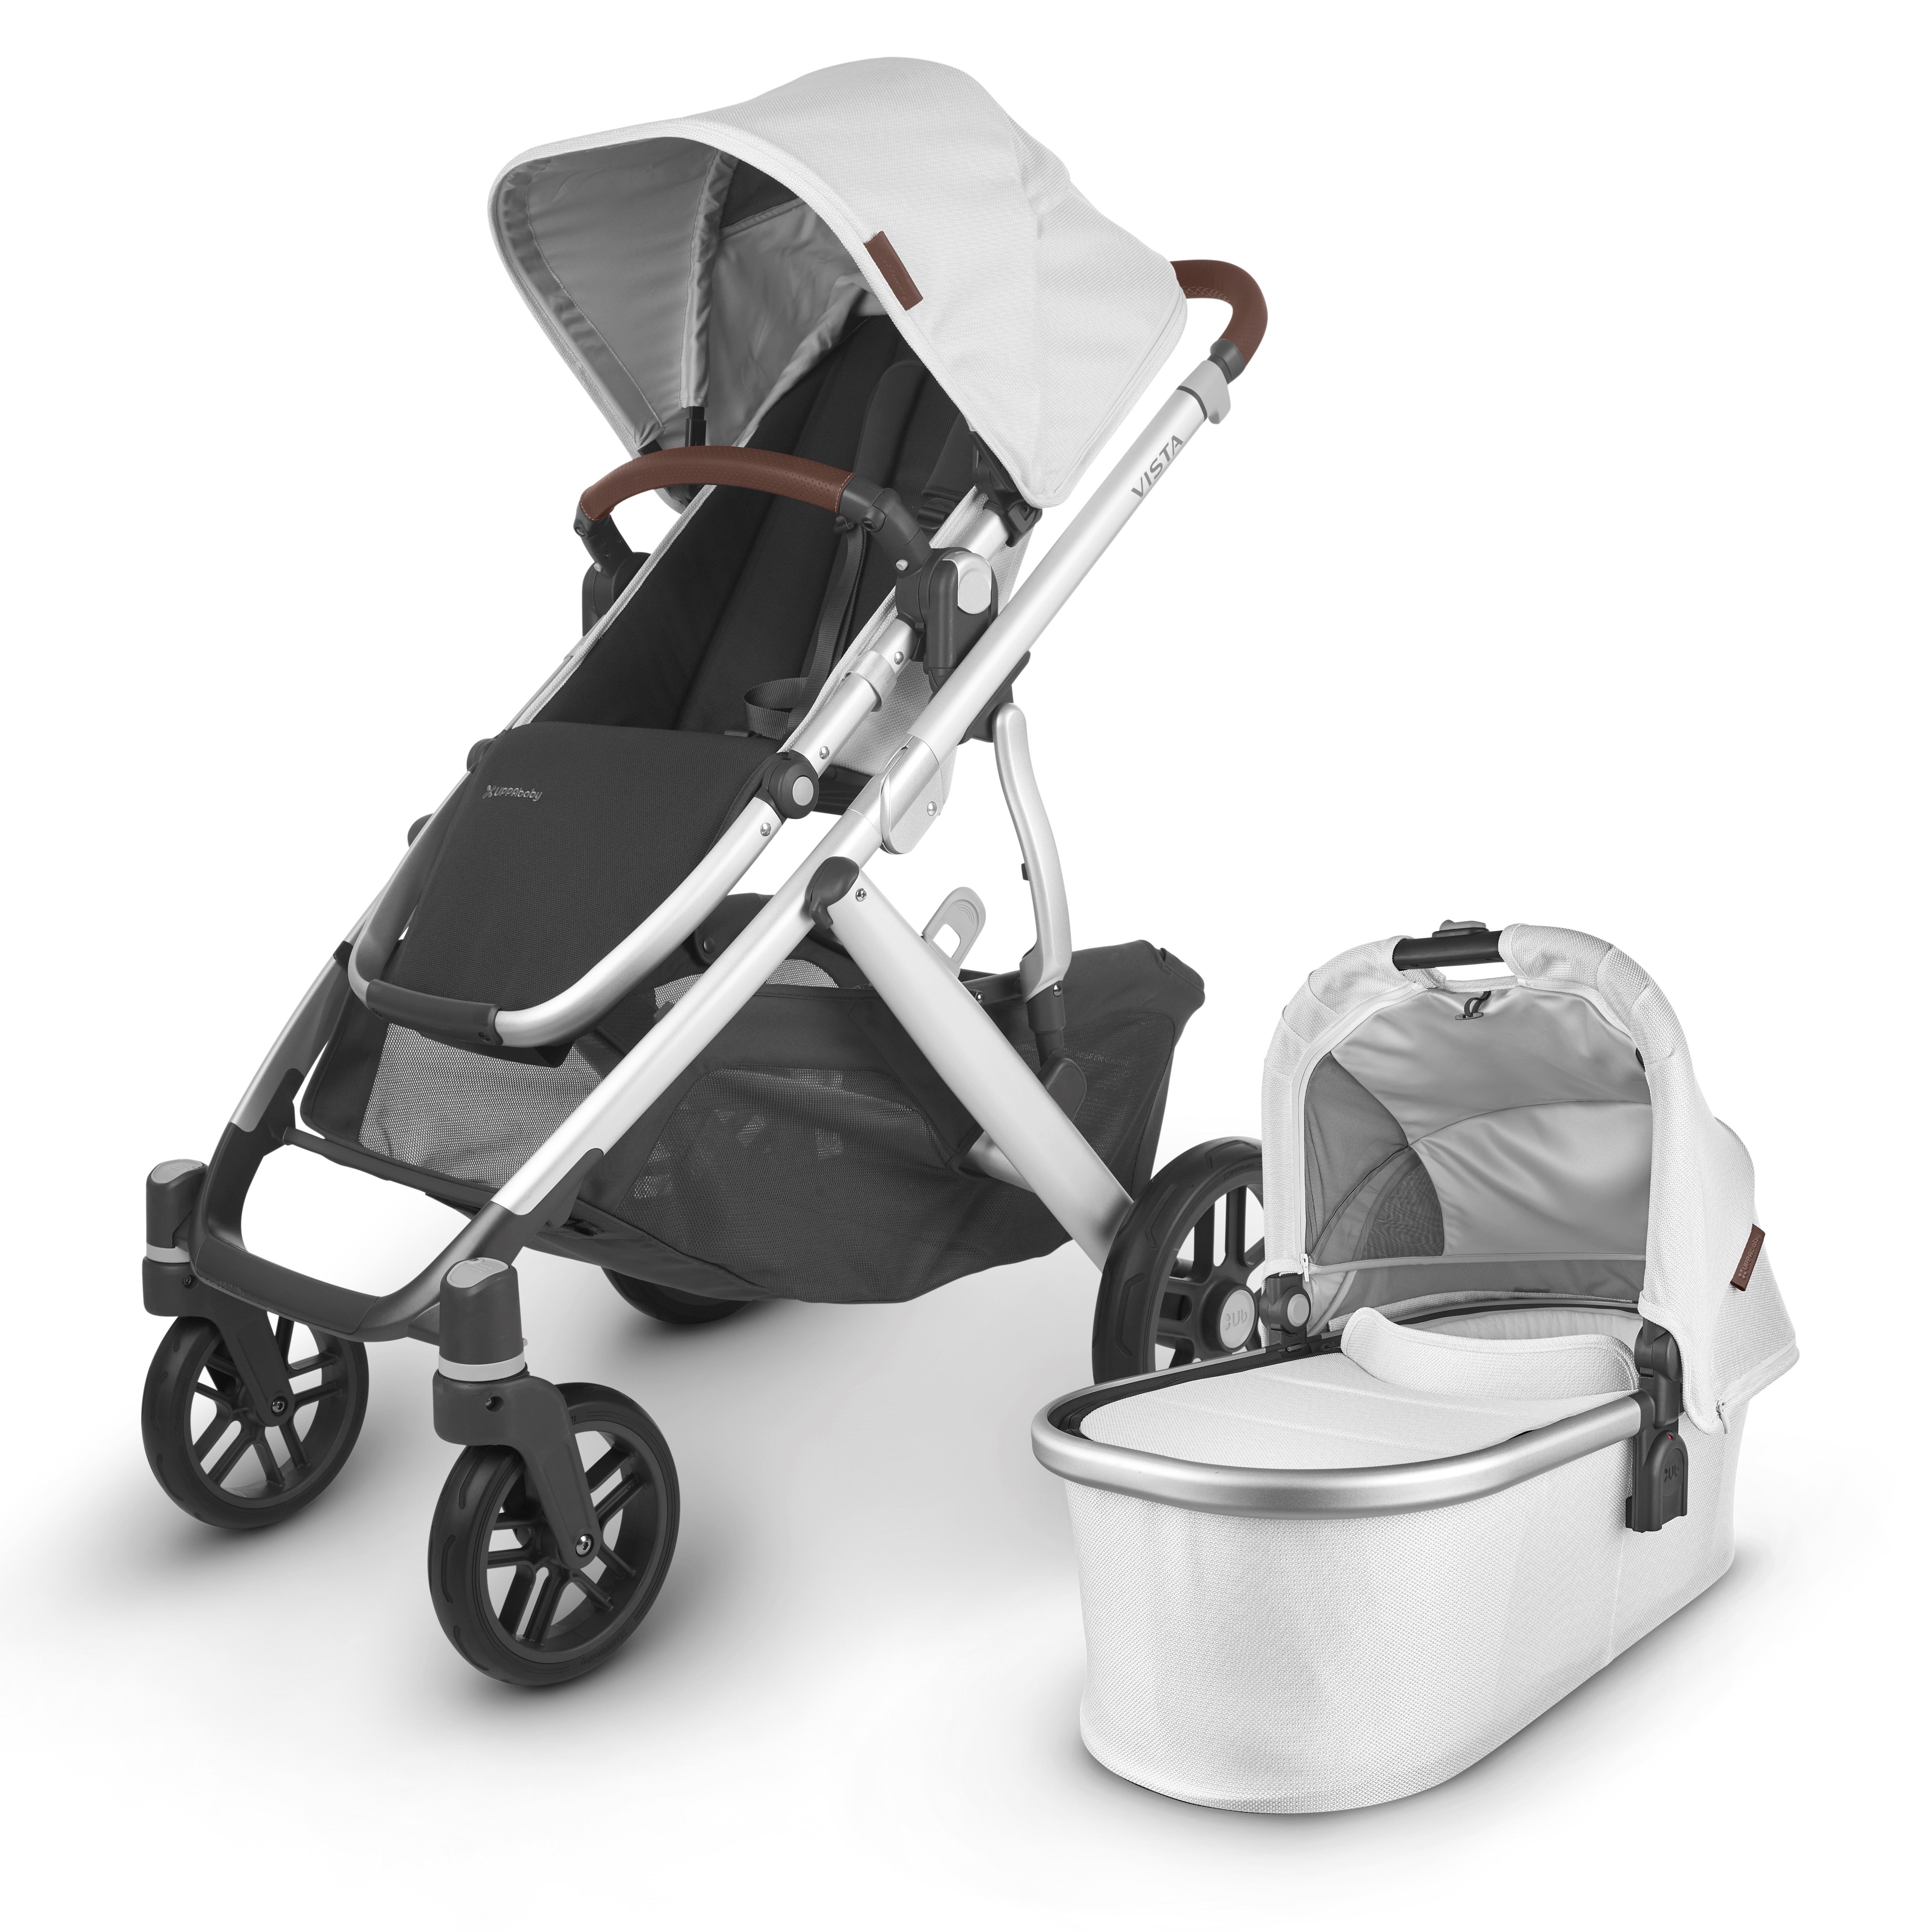 NEW! 2020 UPPAbaby Vista V2 Stroller in White Marl | Shop ...